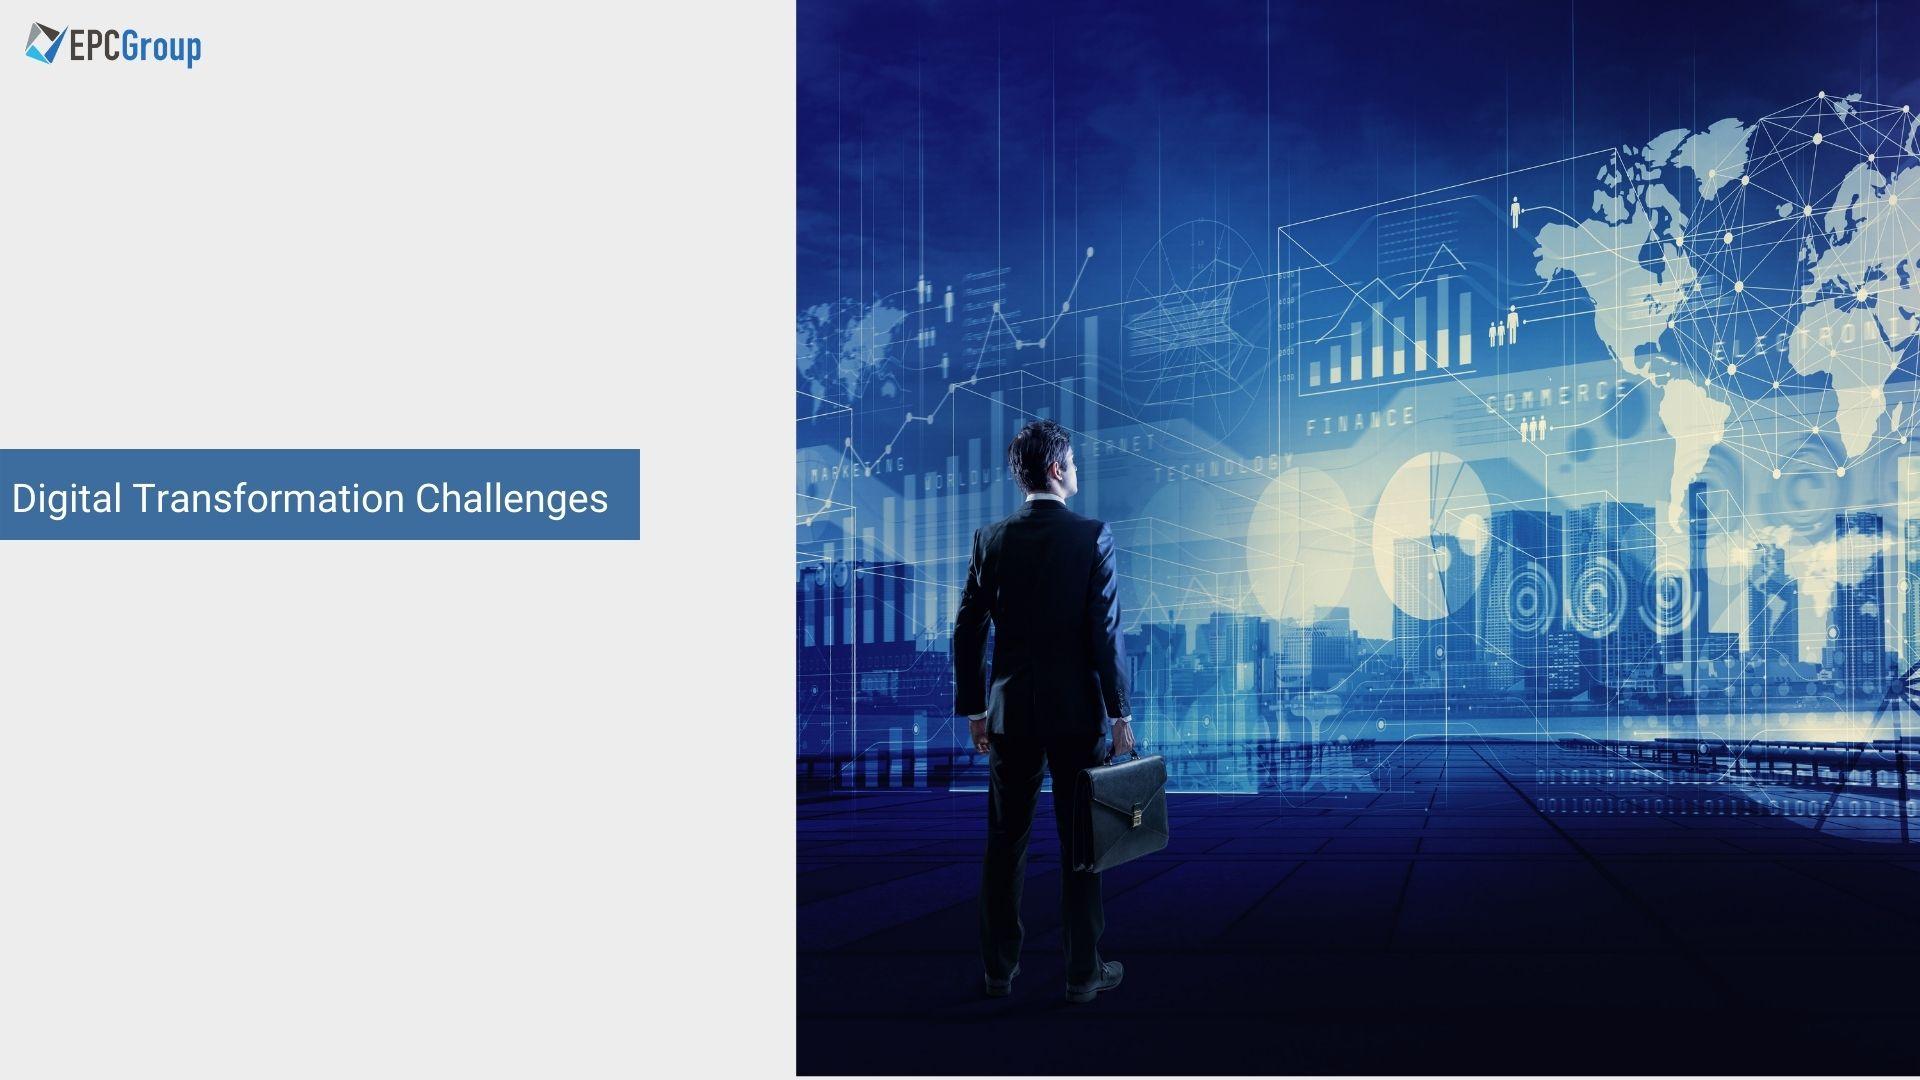 Major Digital Transformation Challenges - thumb image